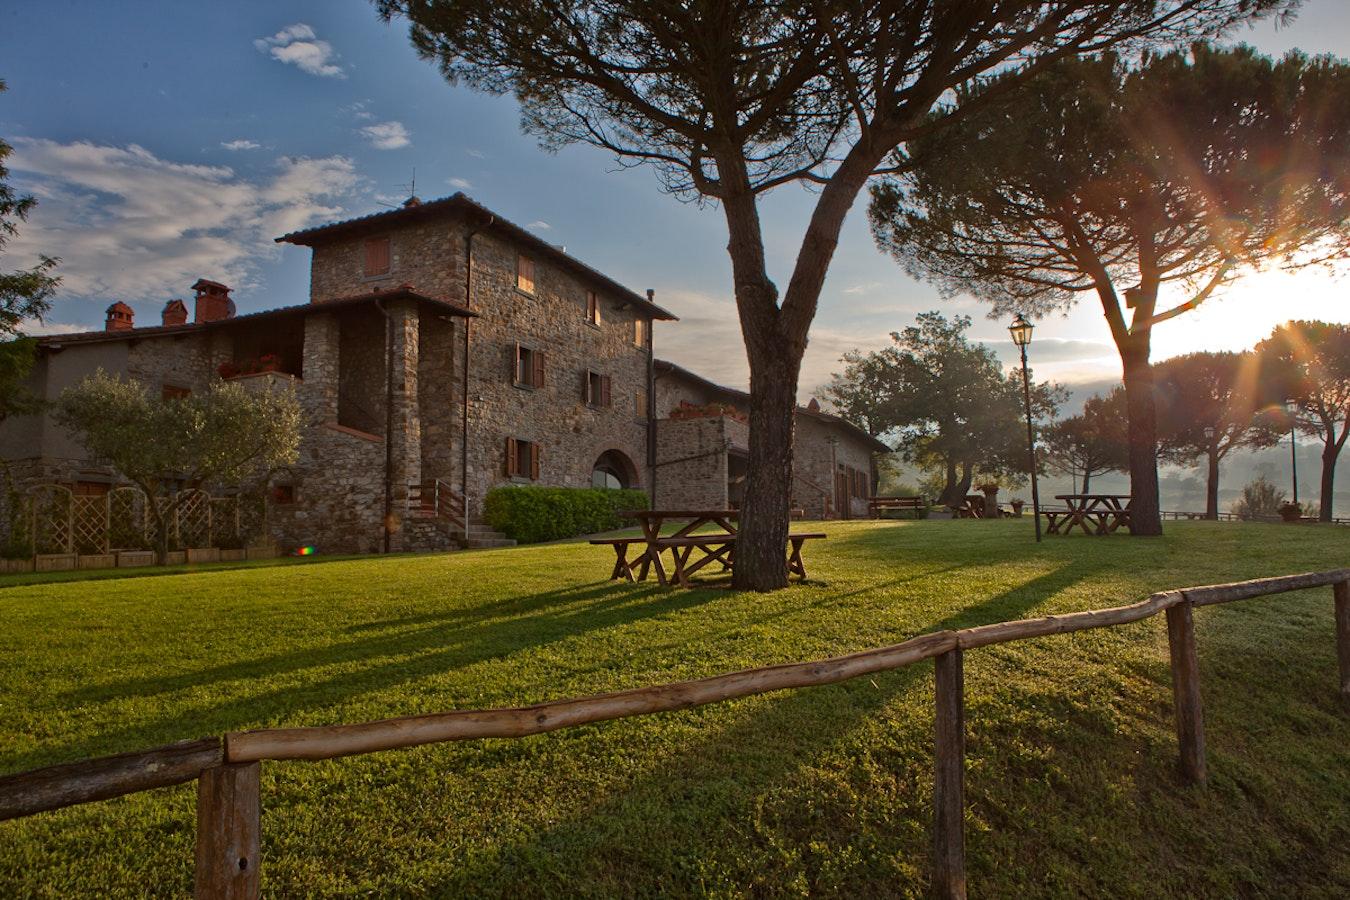 Agriturismo La Collina delle Stelle: Tuscany Accommodations